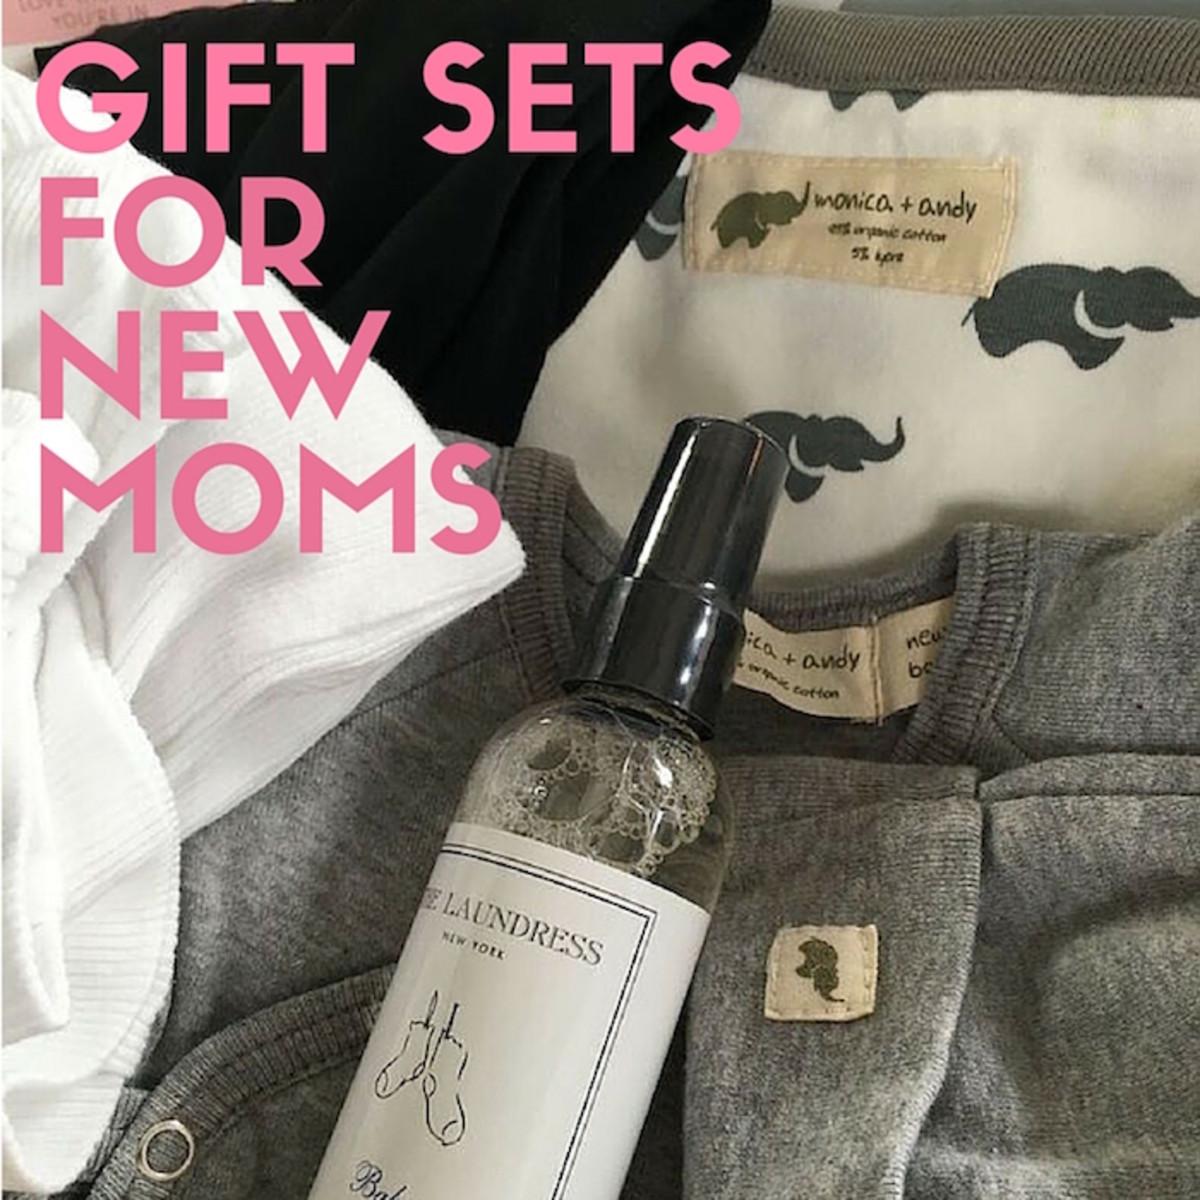 GIFT SETS FOR NEW MOMS